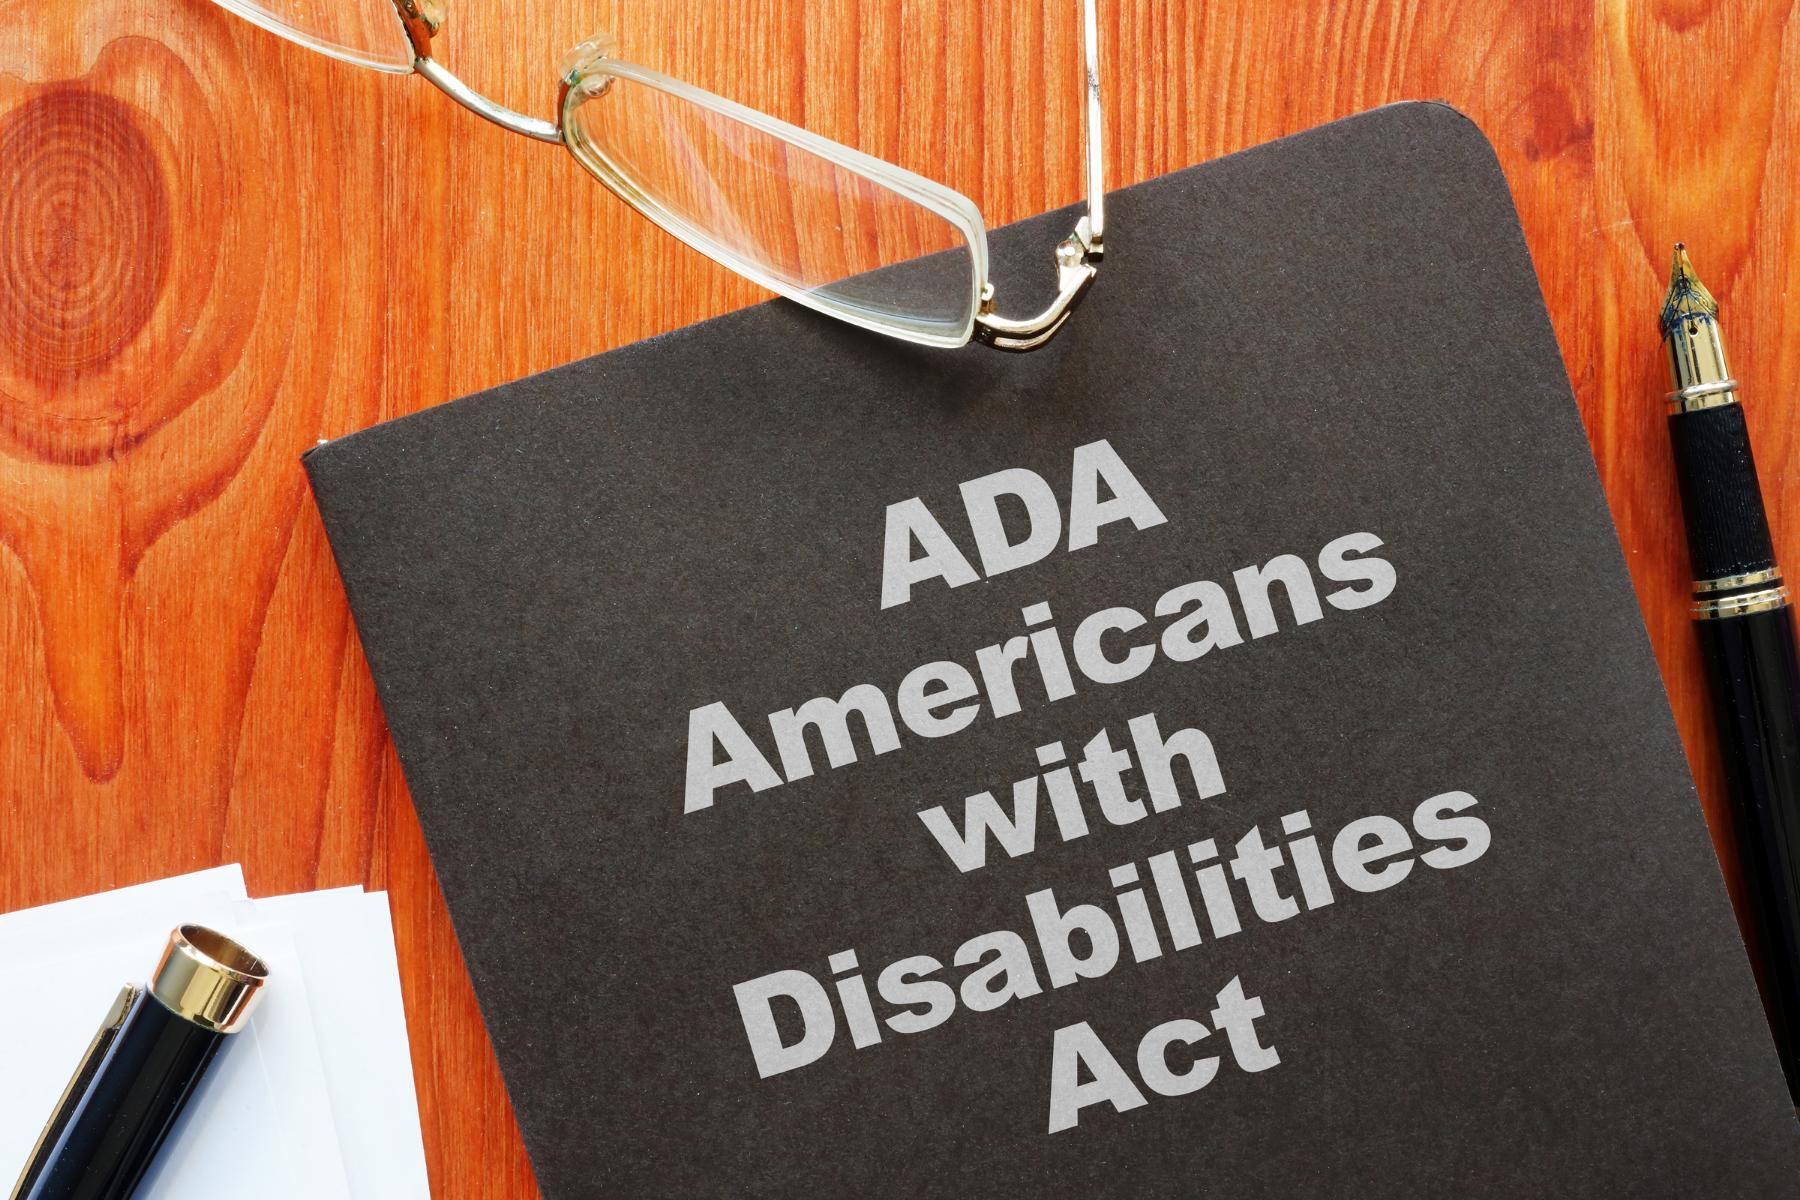 ADA Accessibility